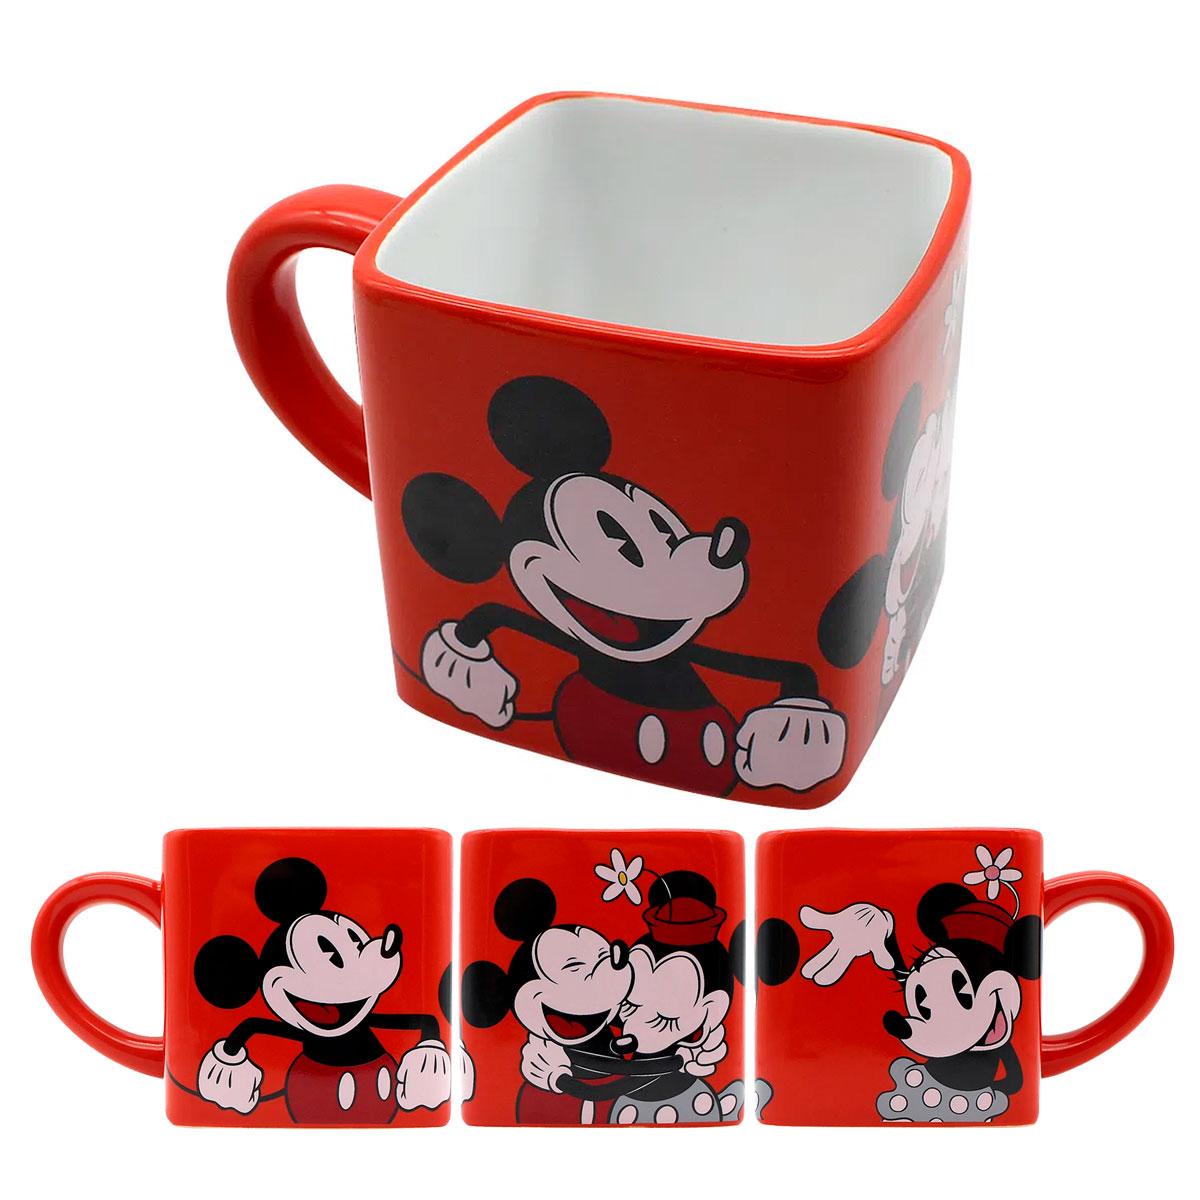 Caneca Quadrada Cubo Mickey e Minnie - Presente Super